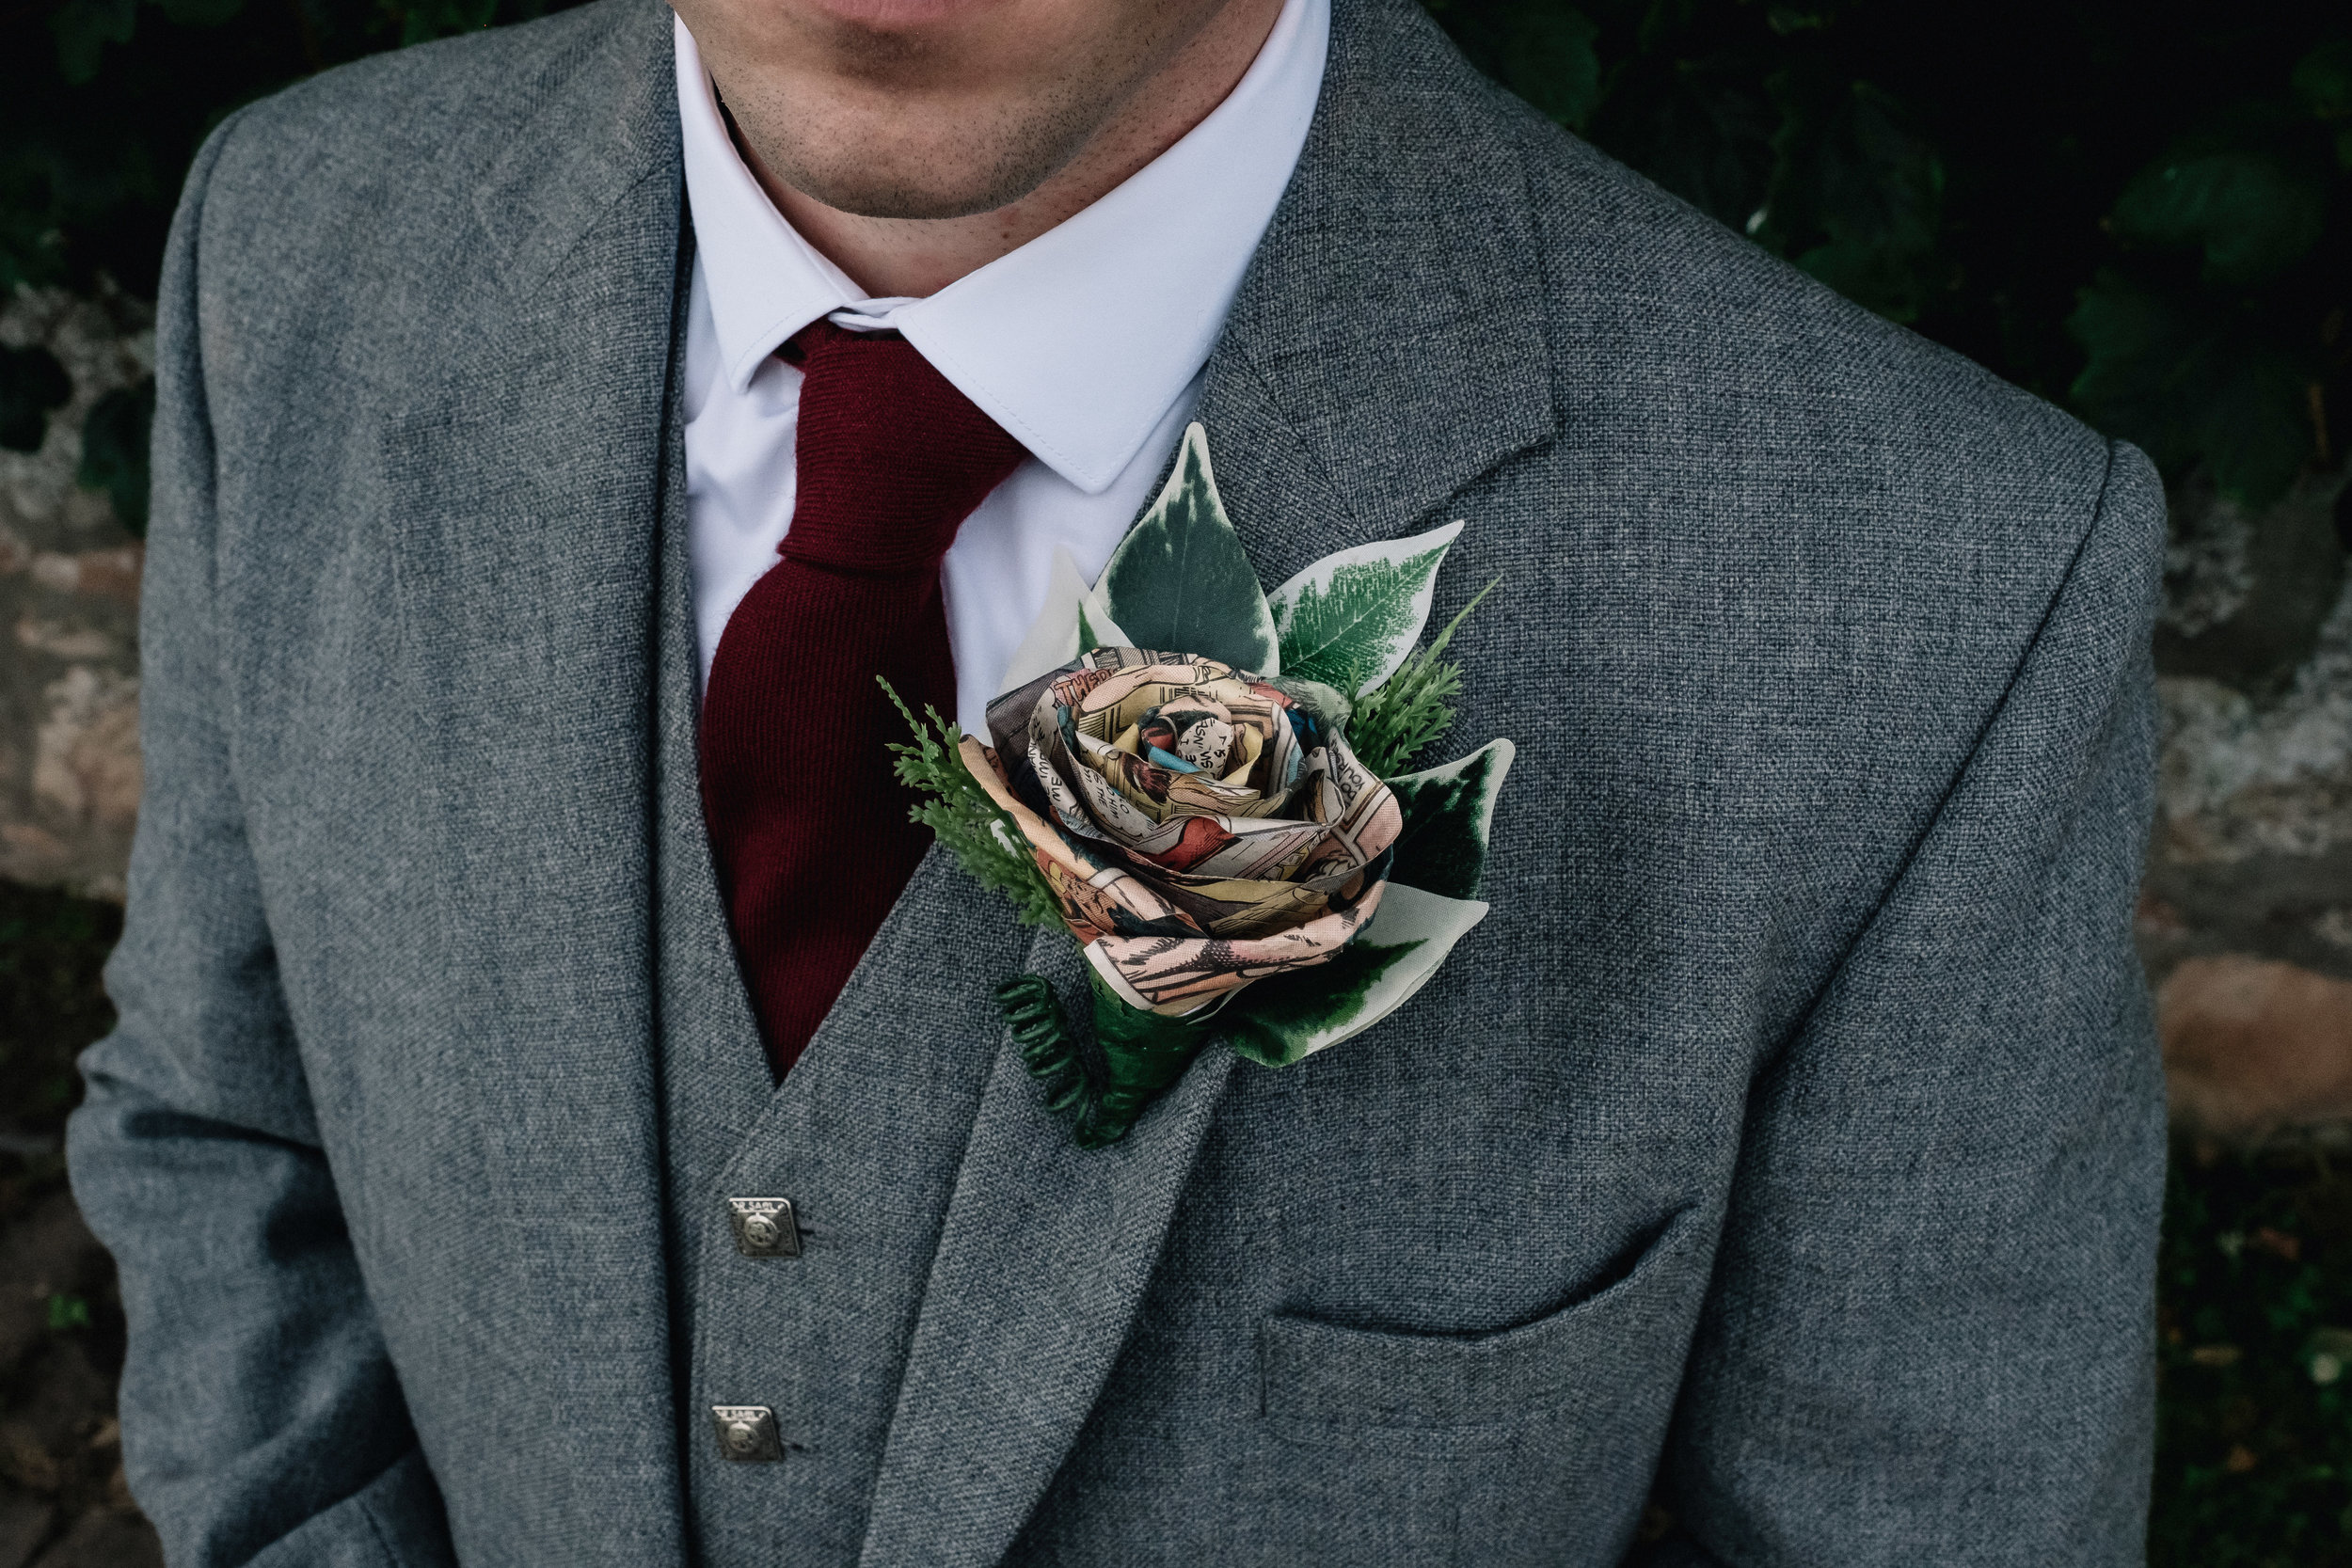 Avenger buttonhole